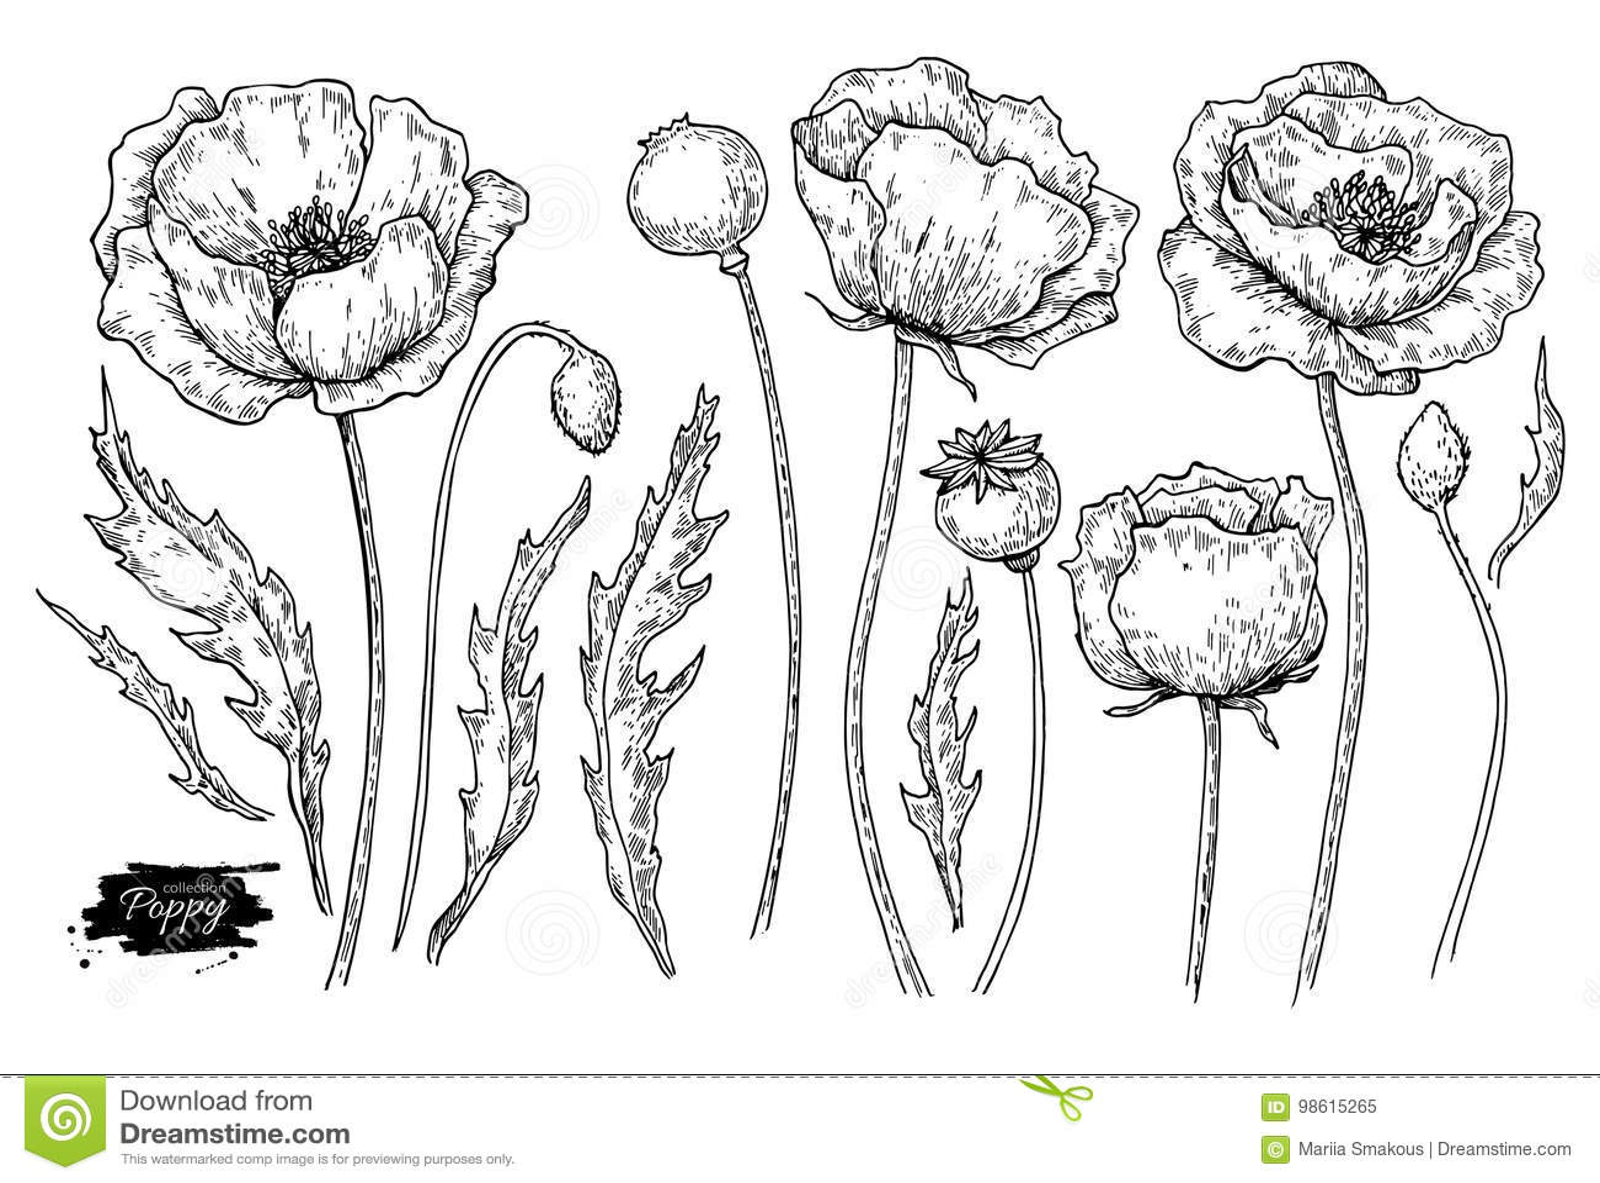 Atemberaubend Blühende Pflanze Reproduktion Arbeitsblatt Ideen ...